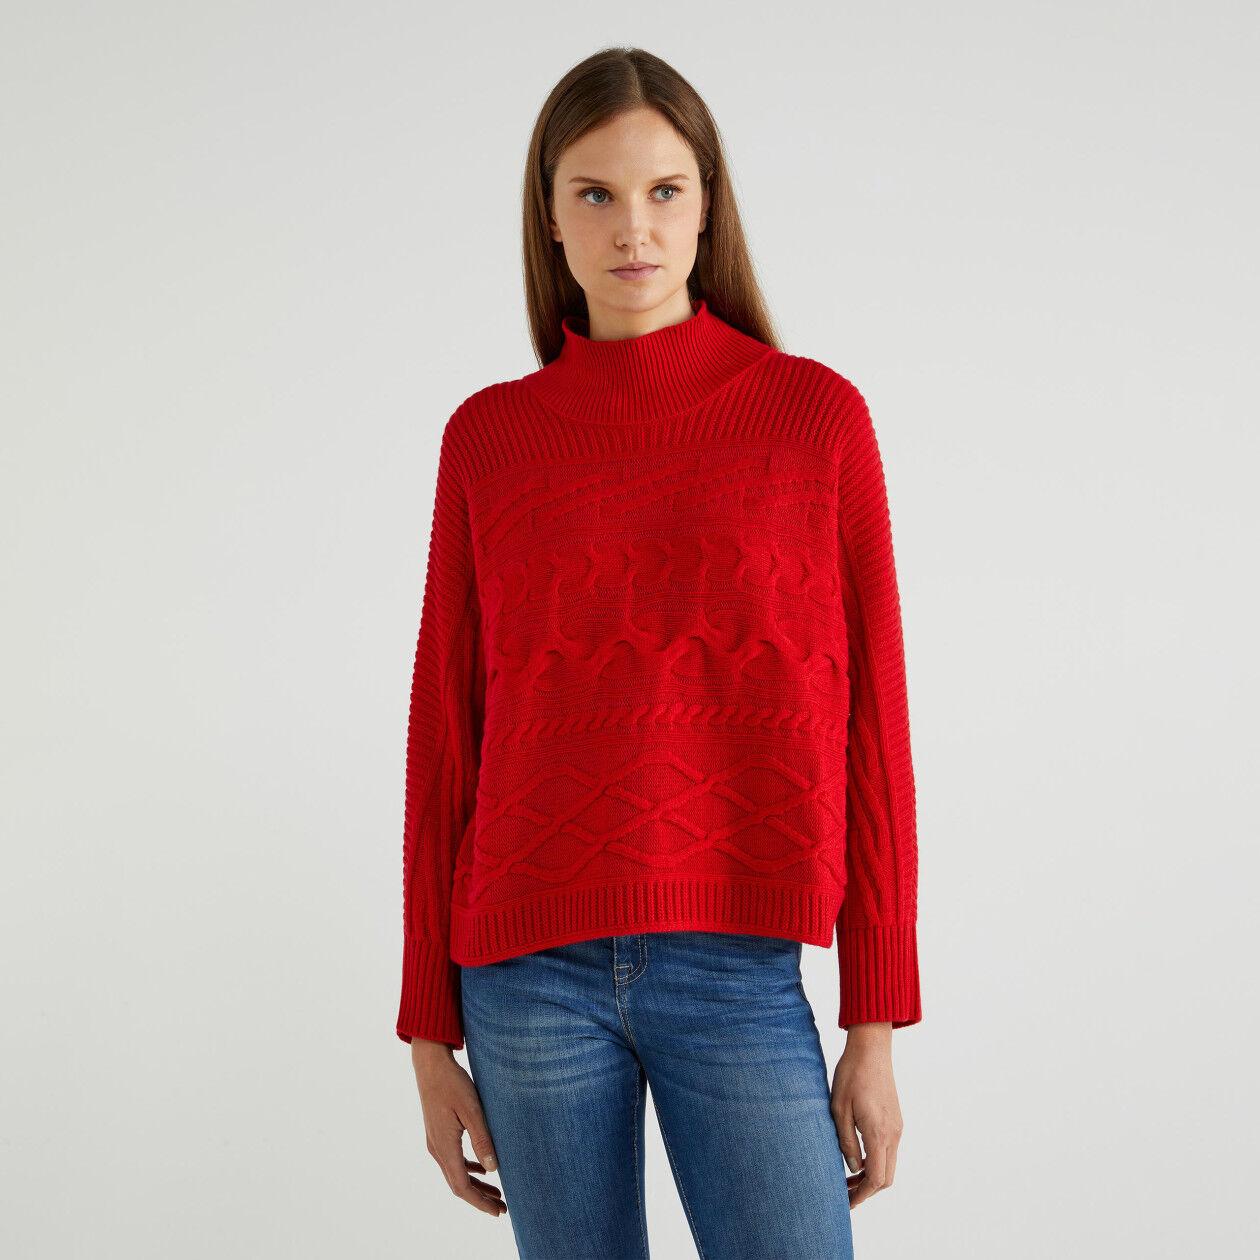 Camisola de gola alta em lã e caxemira